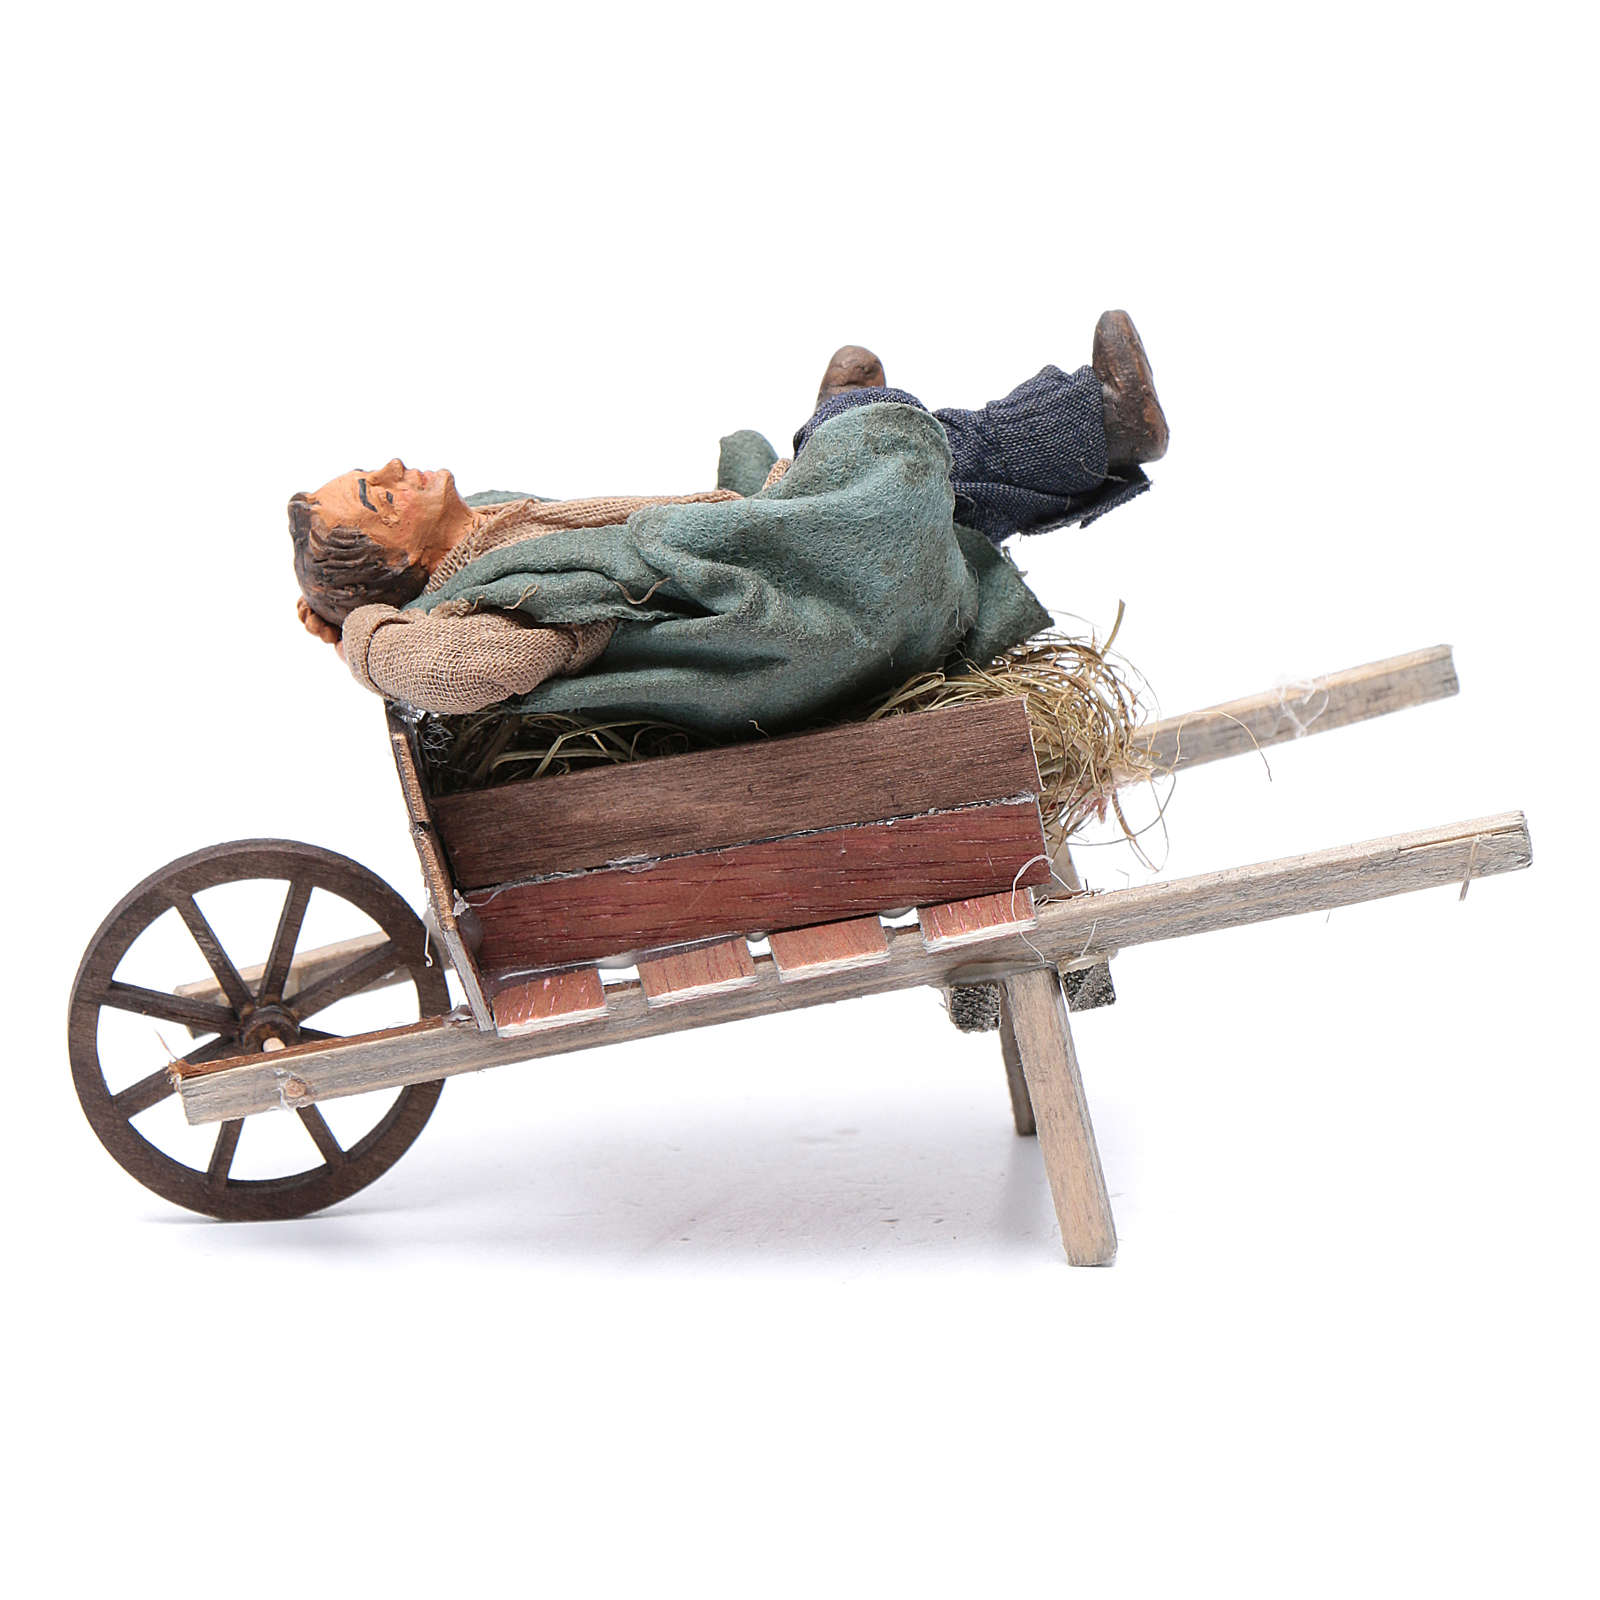 Dormiente in carriola 10 cm presepe di Napoli 4